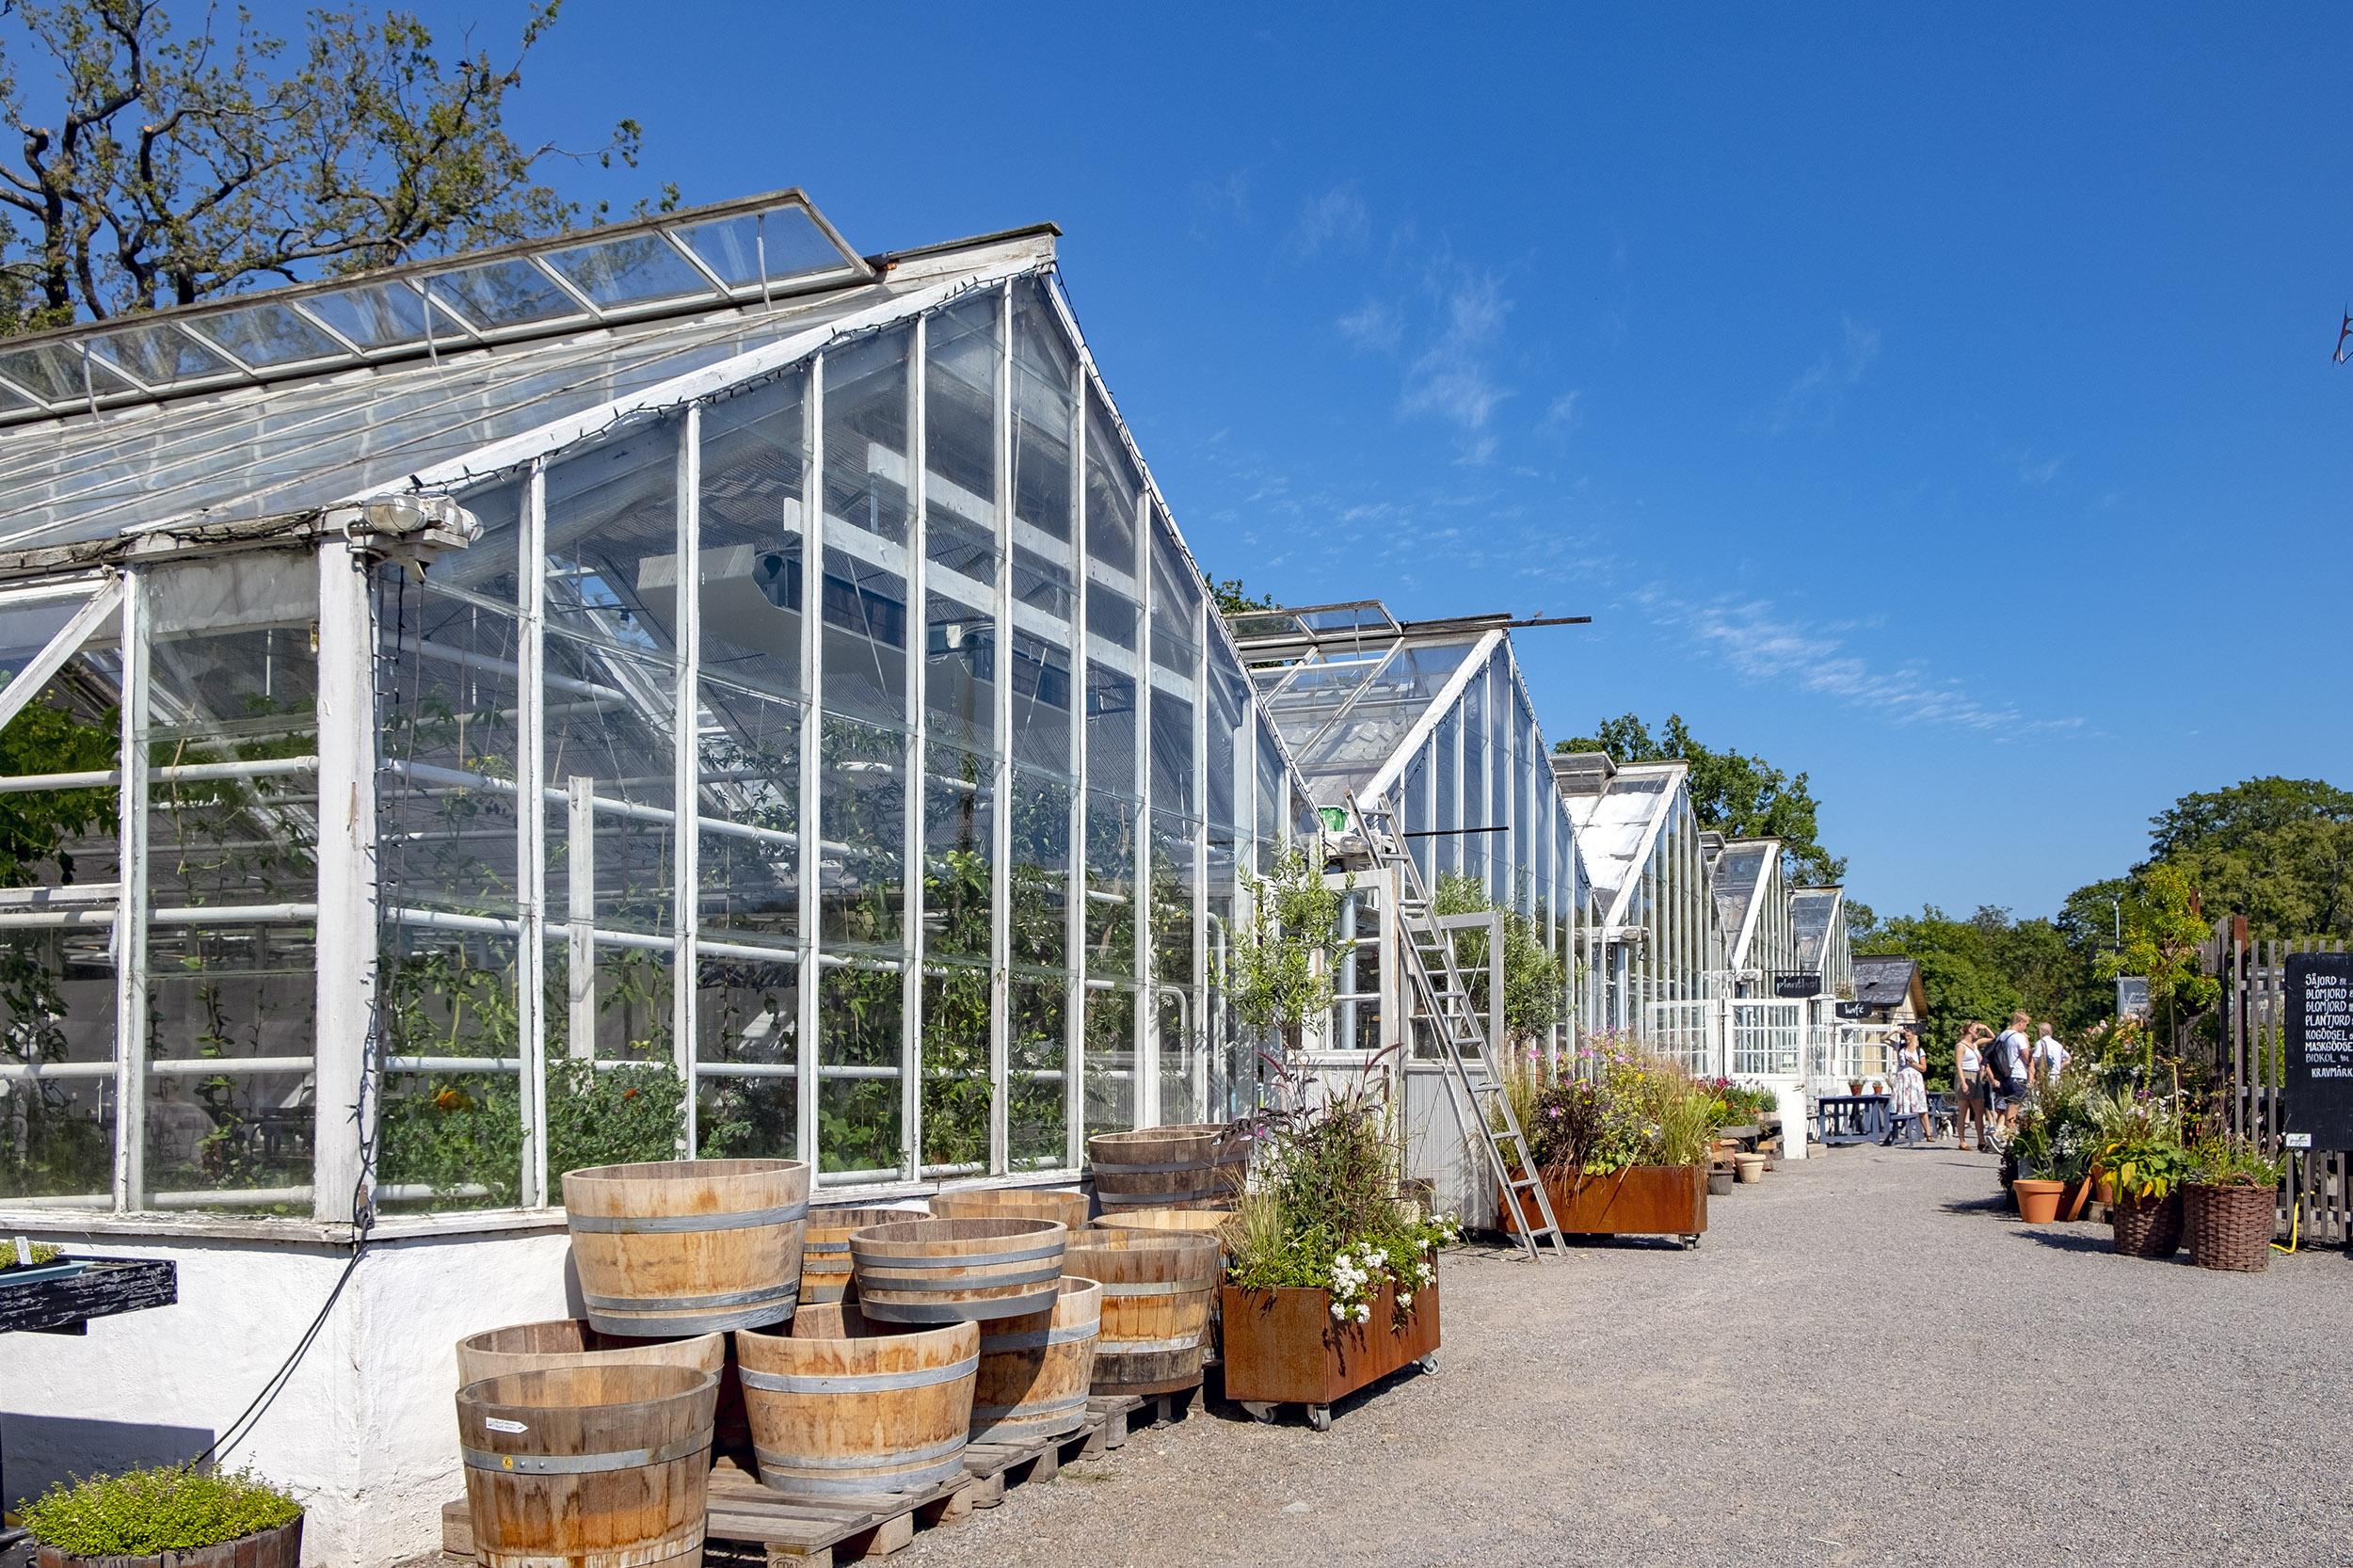 Rosendals trädgård sommarcaféer